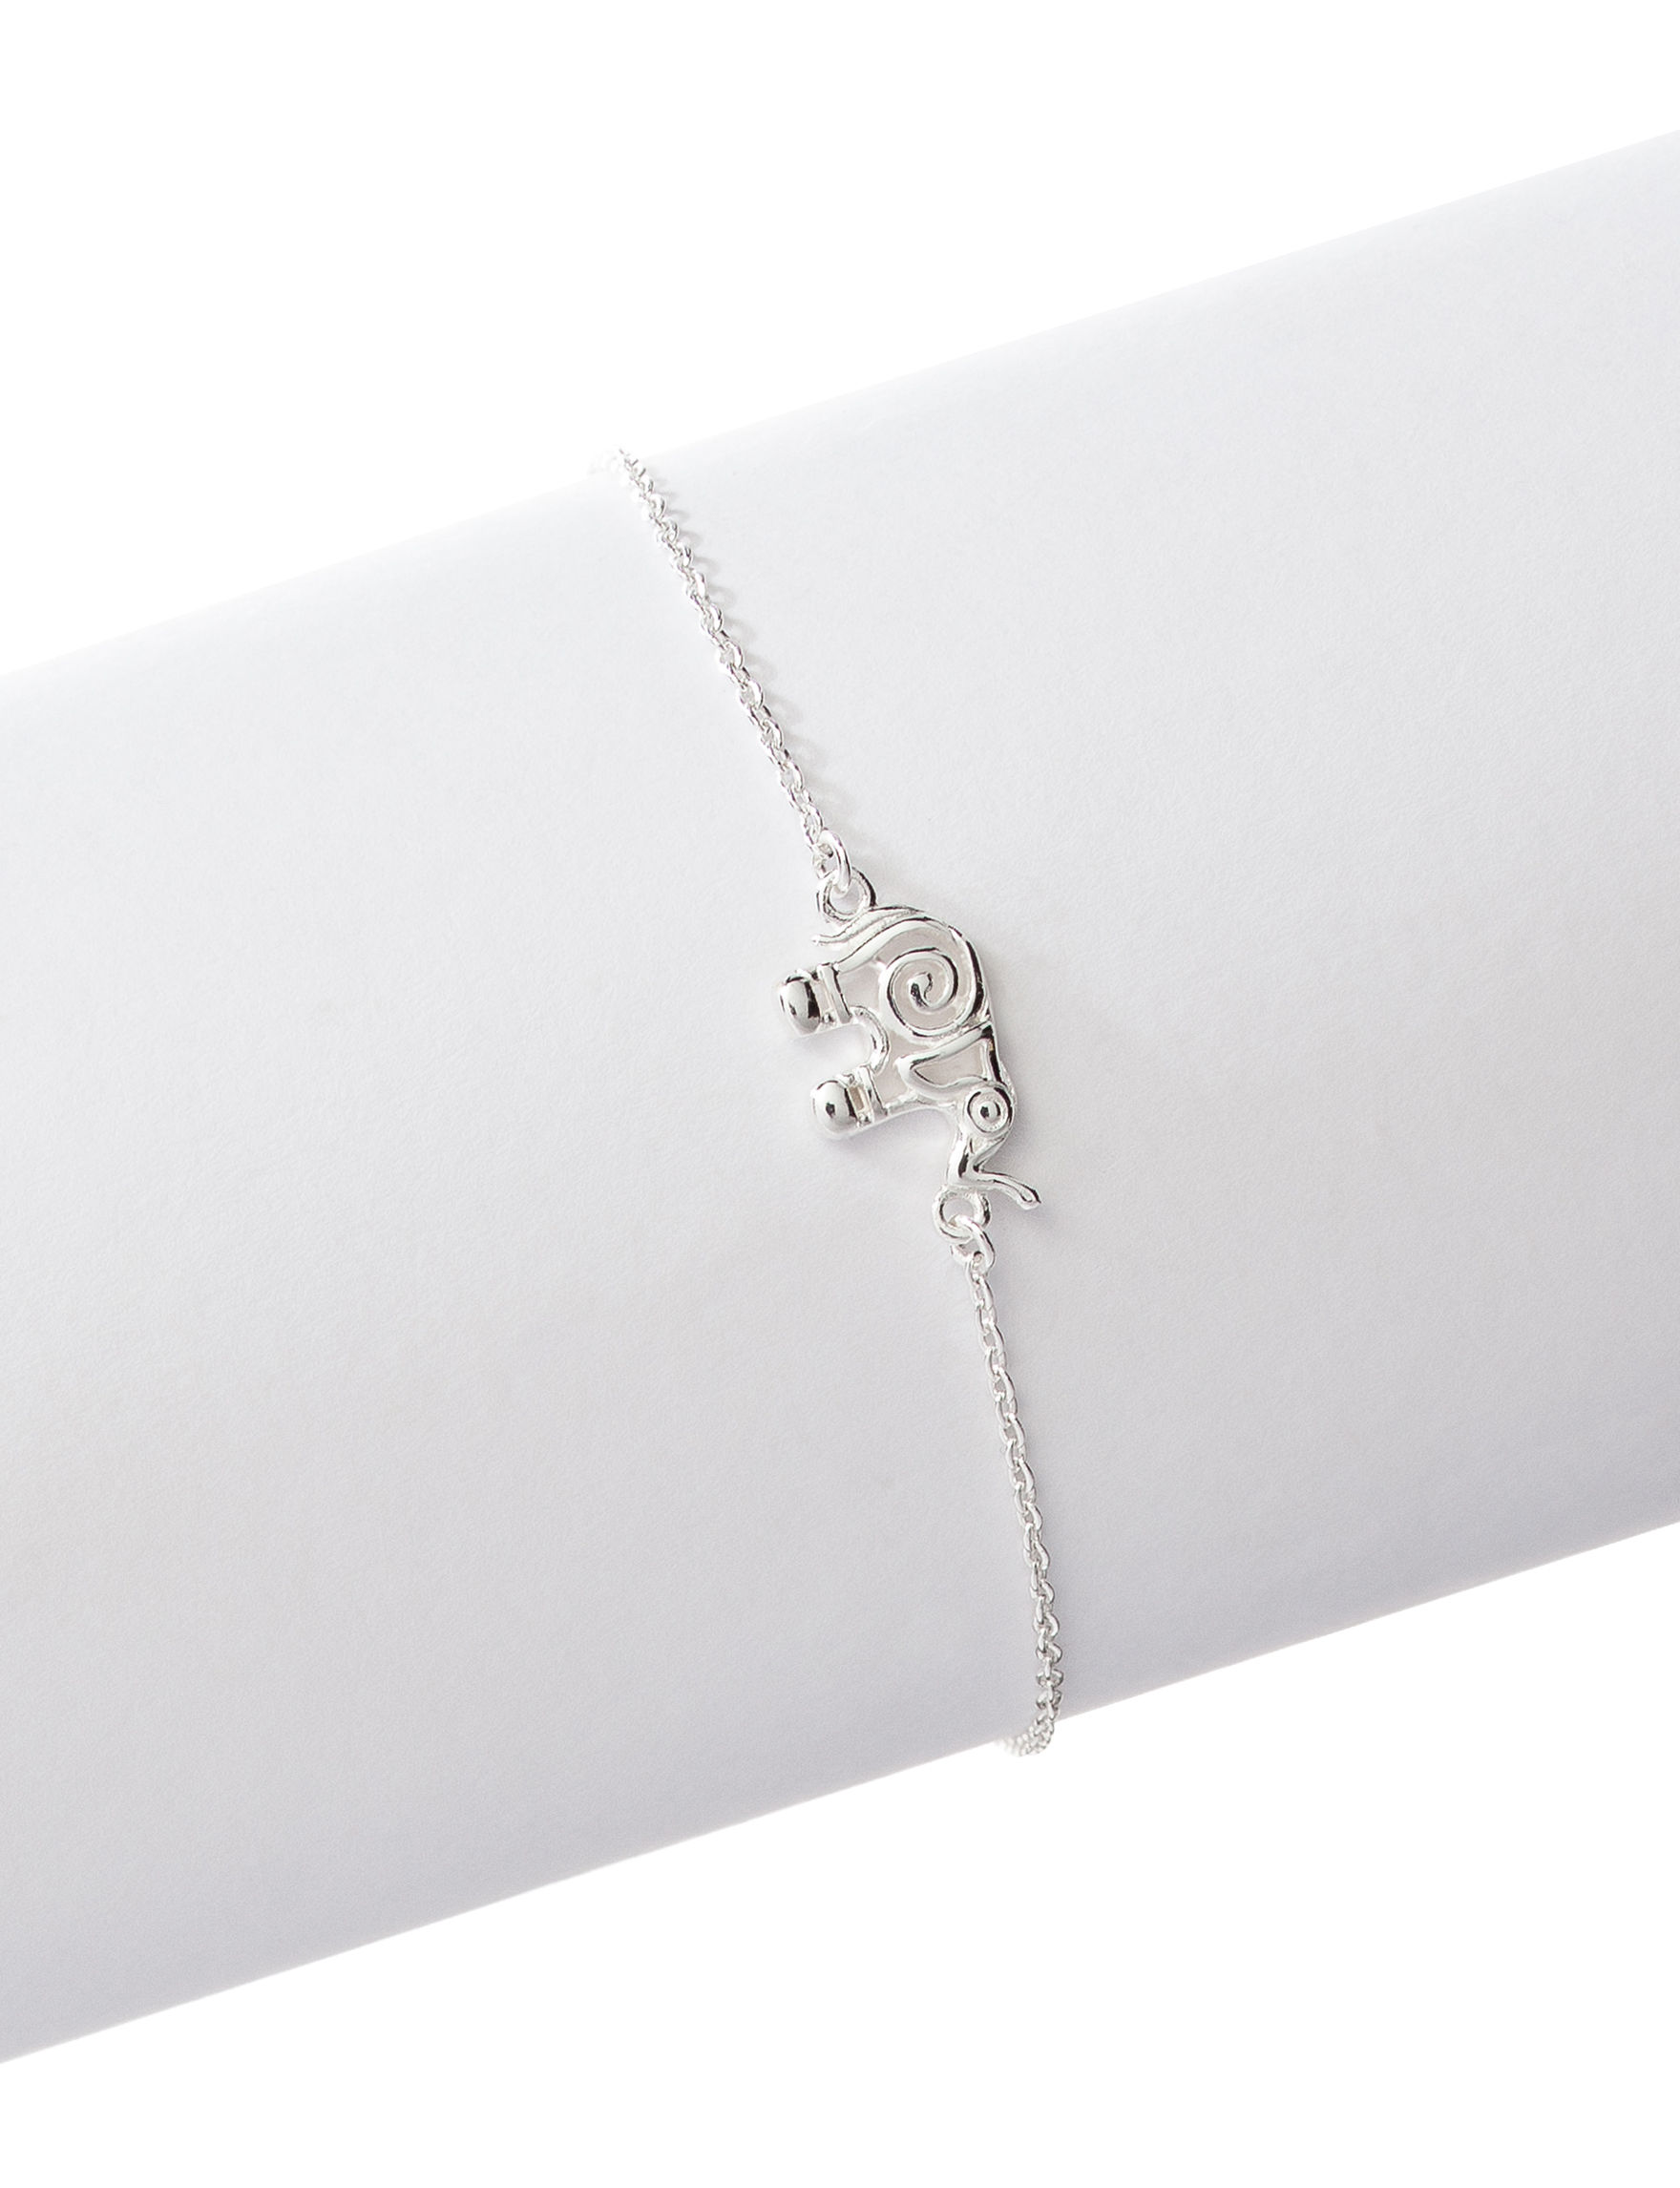 Marsala SIlver Anklets Fine Jewelry